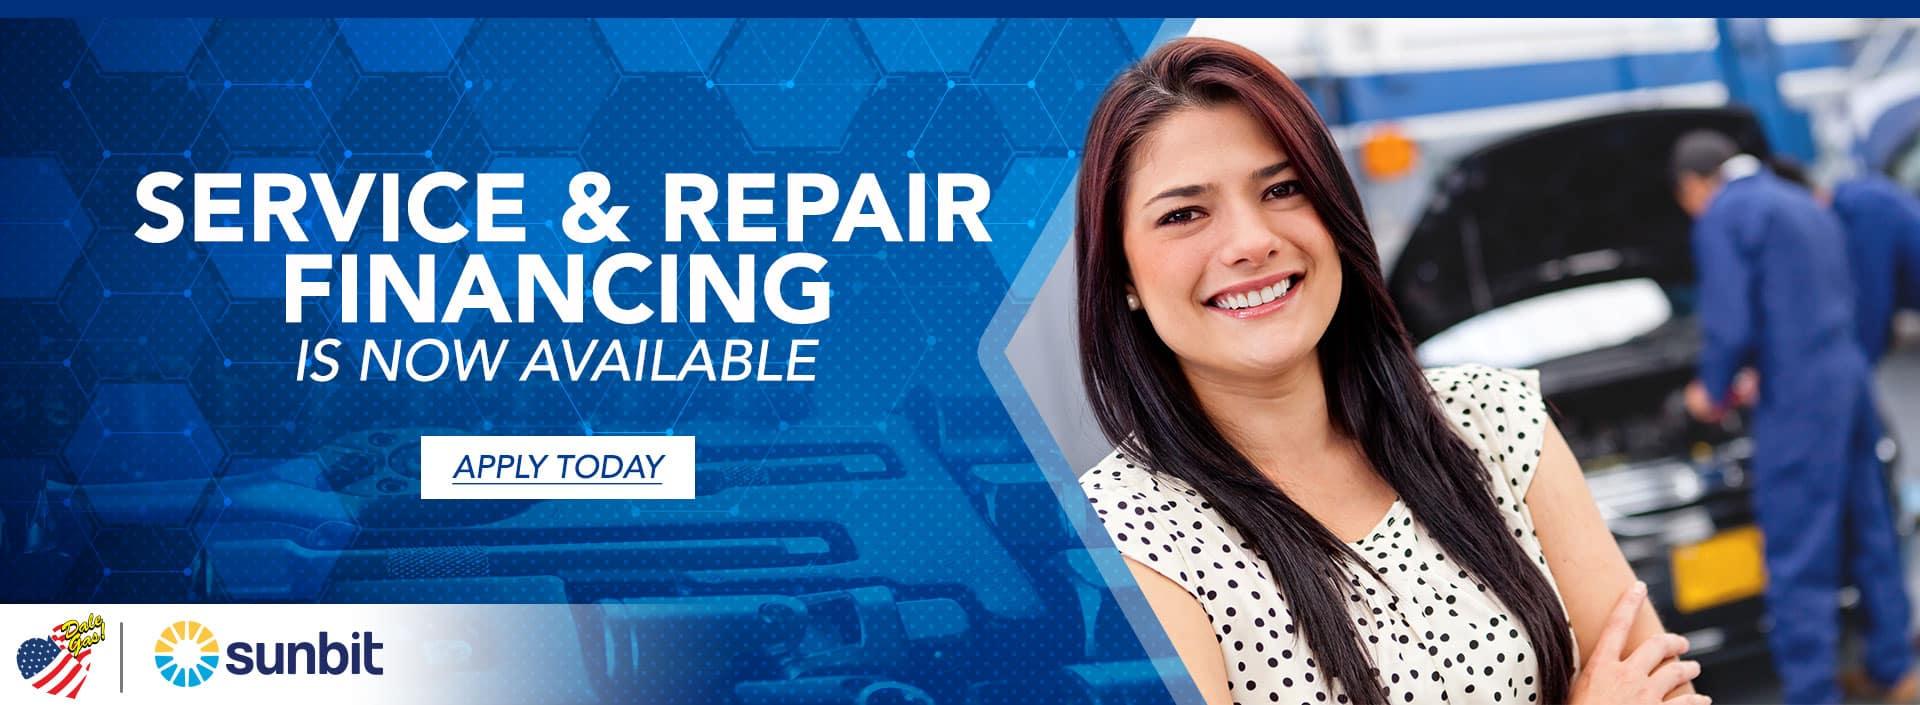 Service & Repair Financing | Fiesta Chevrolet in Edinburg, Texas